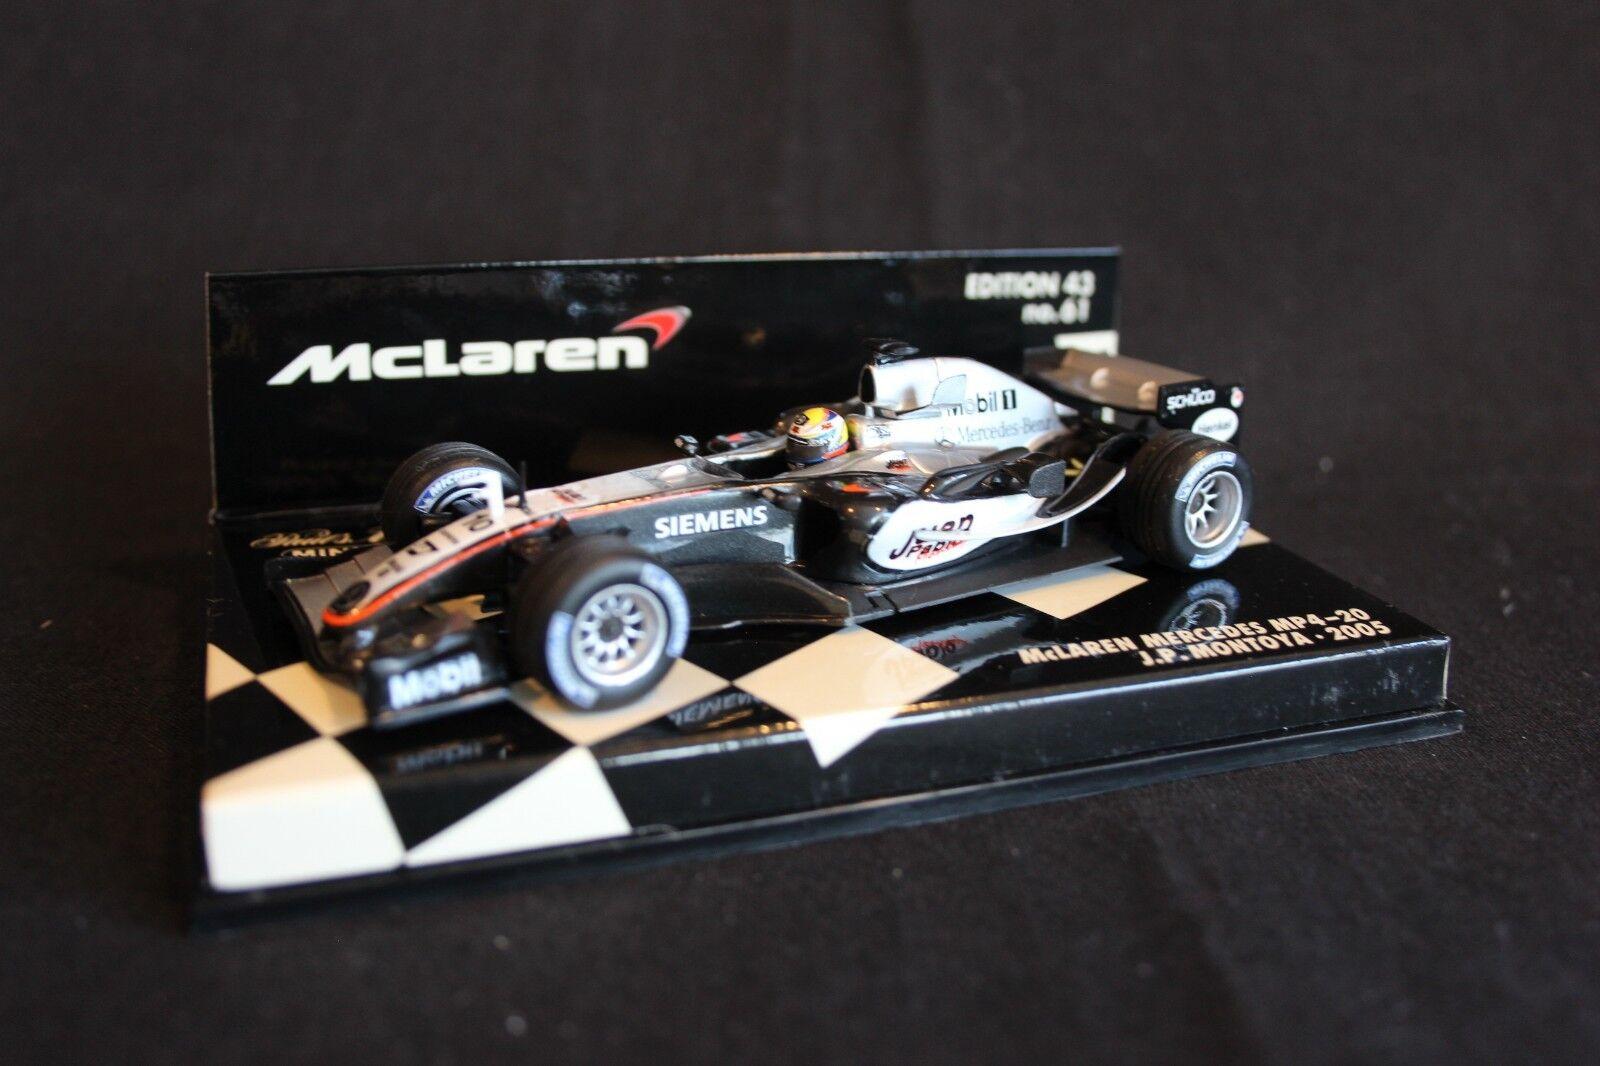 Minichamps McLaren Mercedes MP4-20 2005 1 43  10 Juan Pablo Montoya (COL)